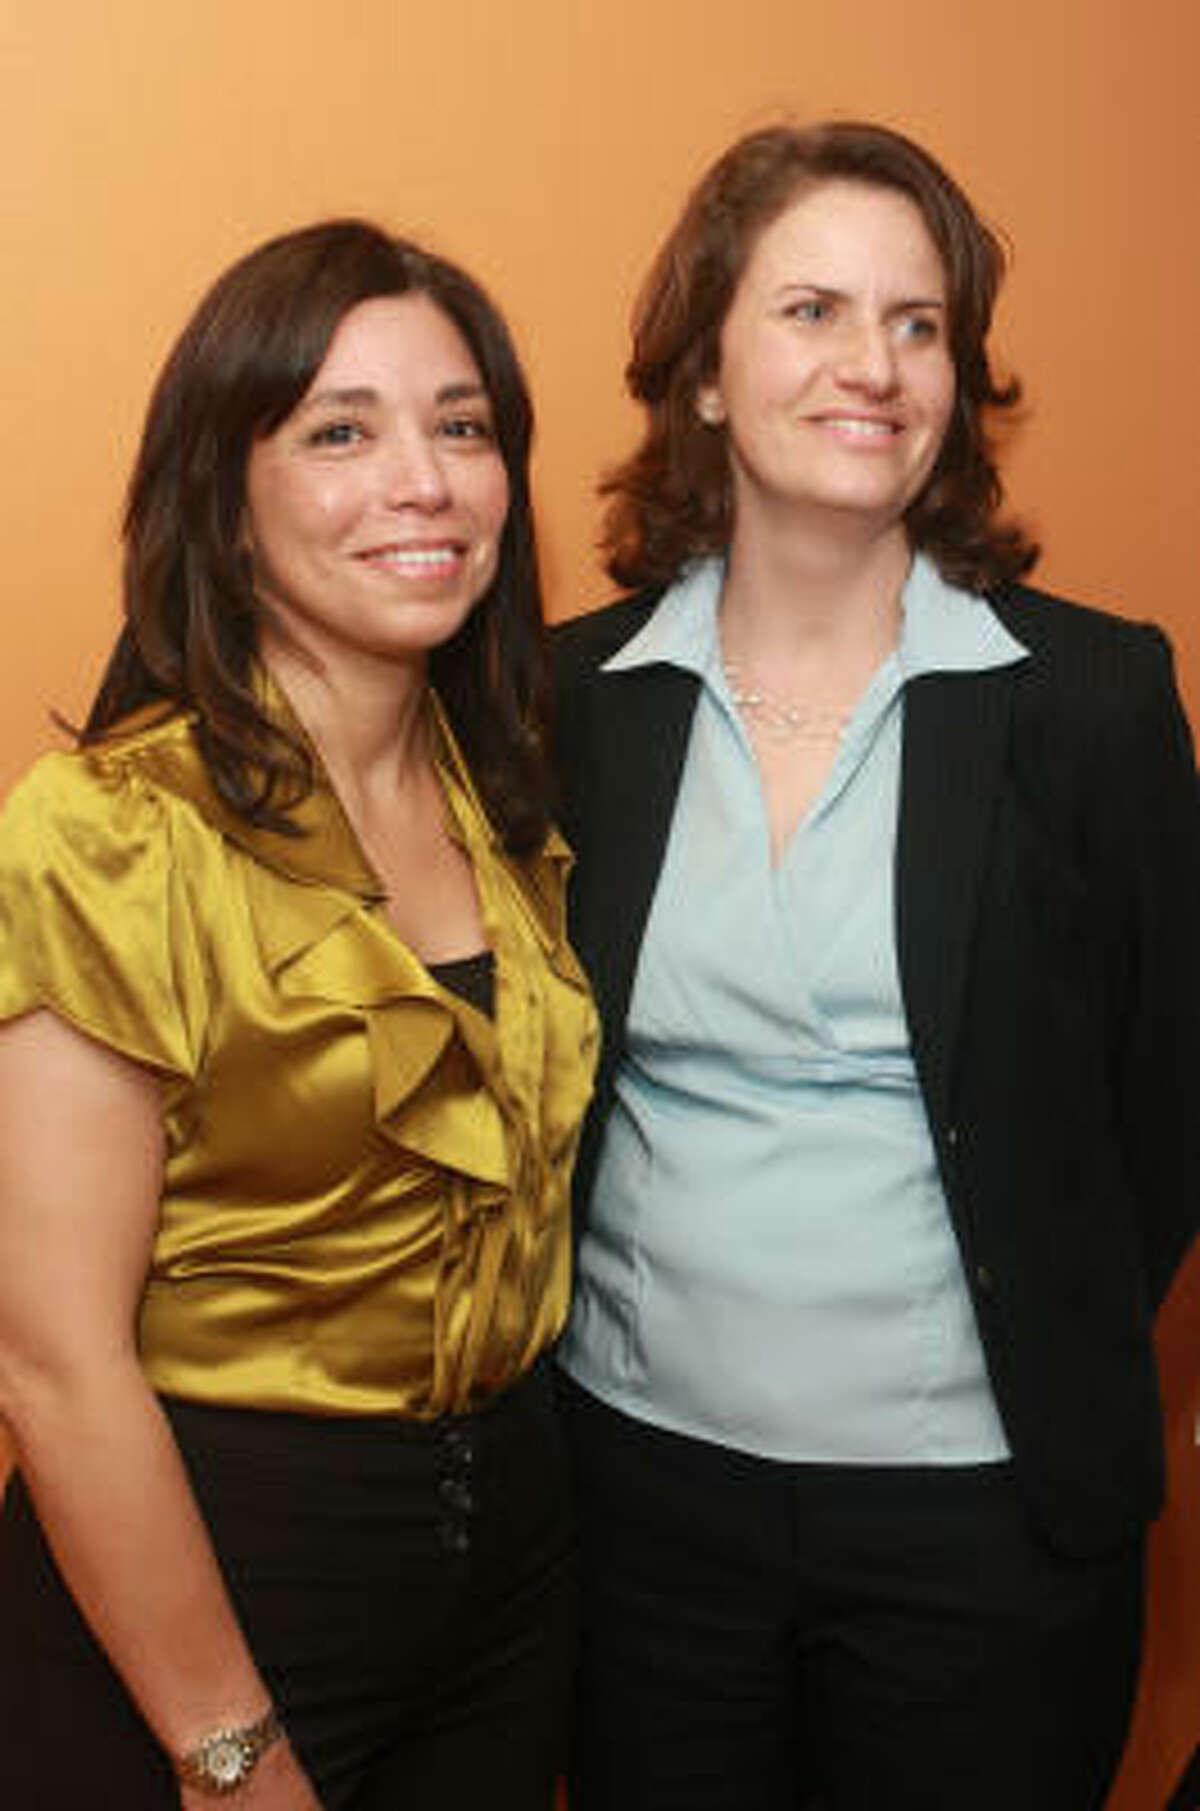 Laura Jaramillo, left, and Amanda Timm